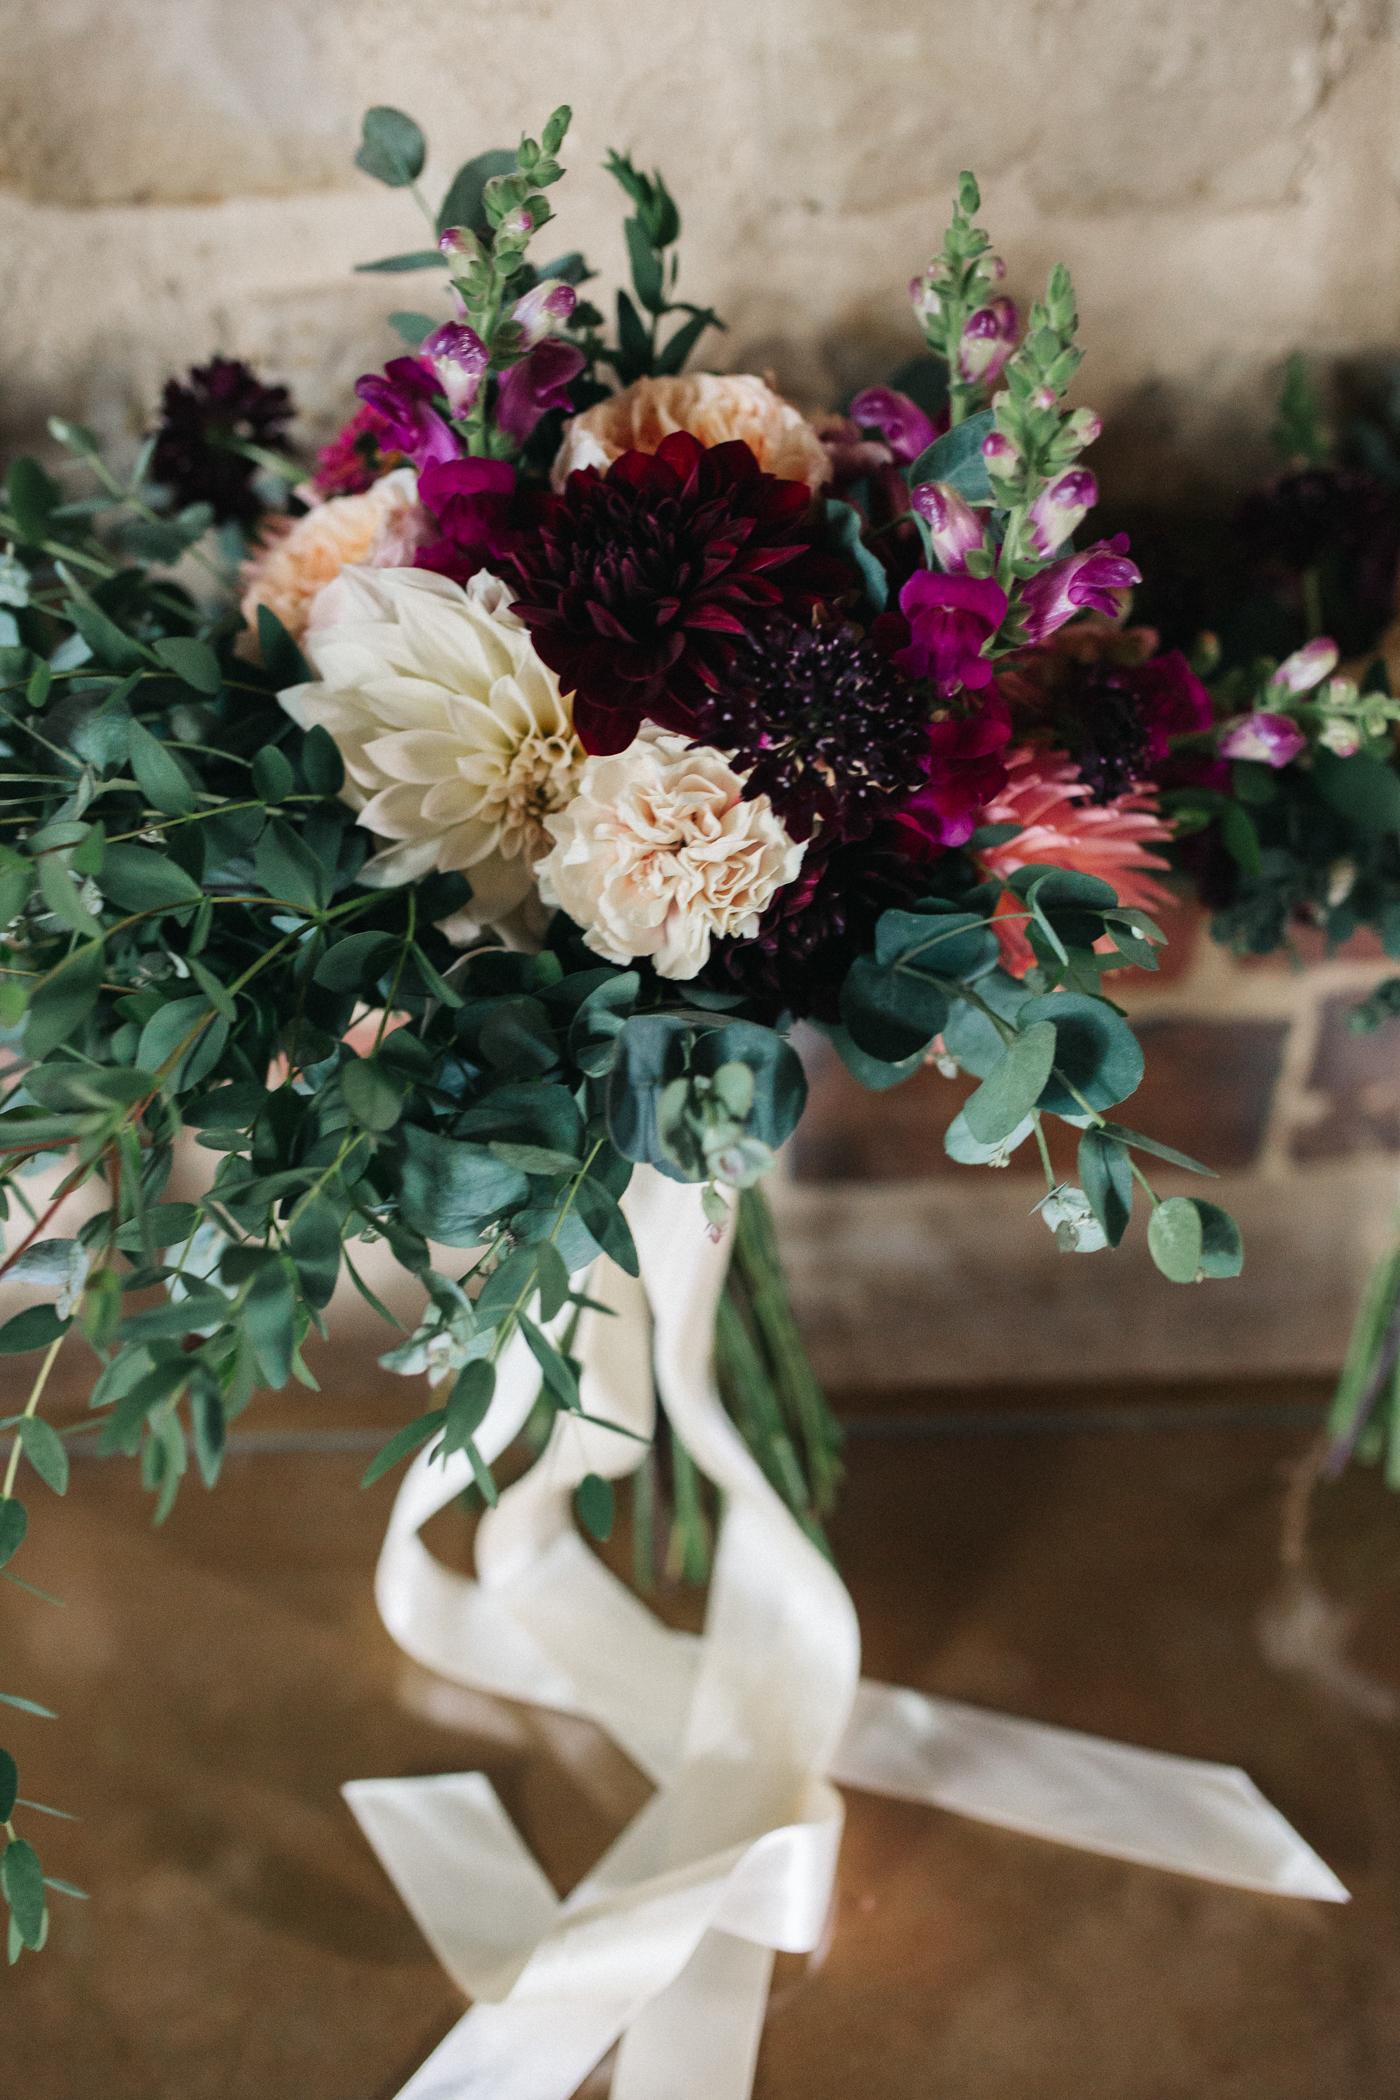 bentley-wildfowl-motor-museum-wedding-photographer-lewes-brighton-east-sussex-0011.jpg